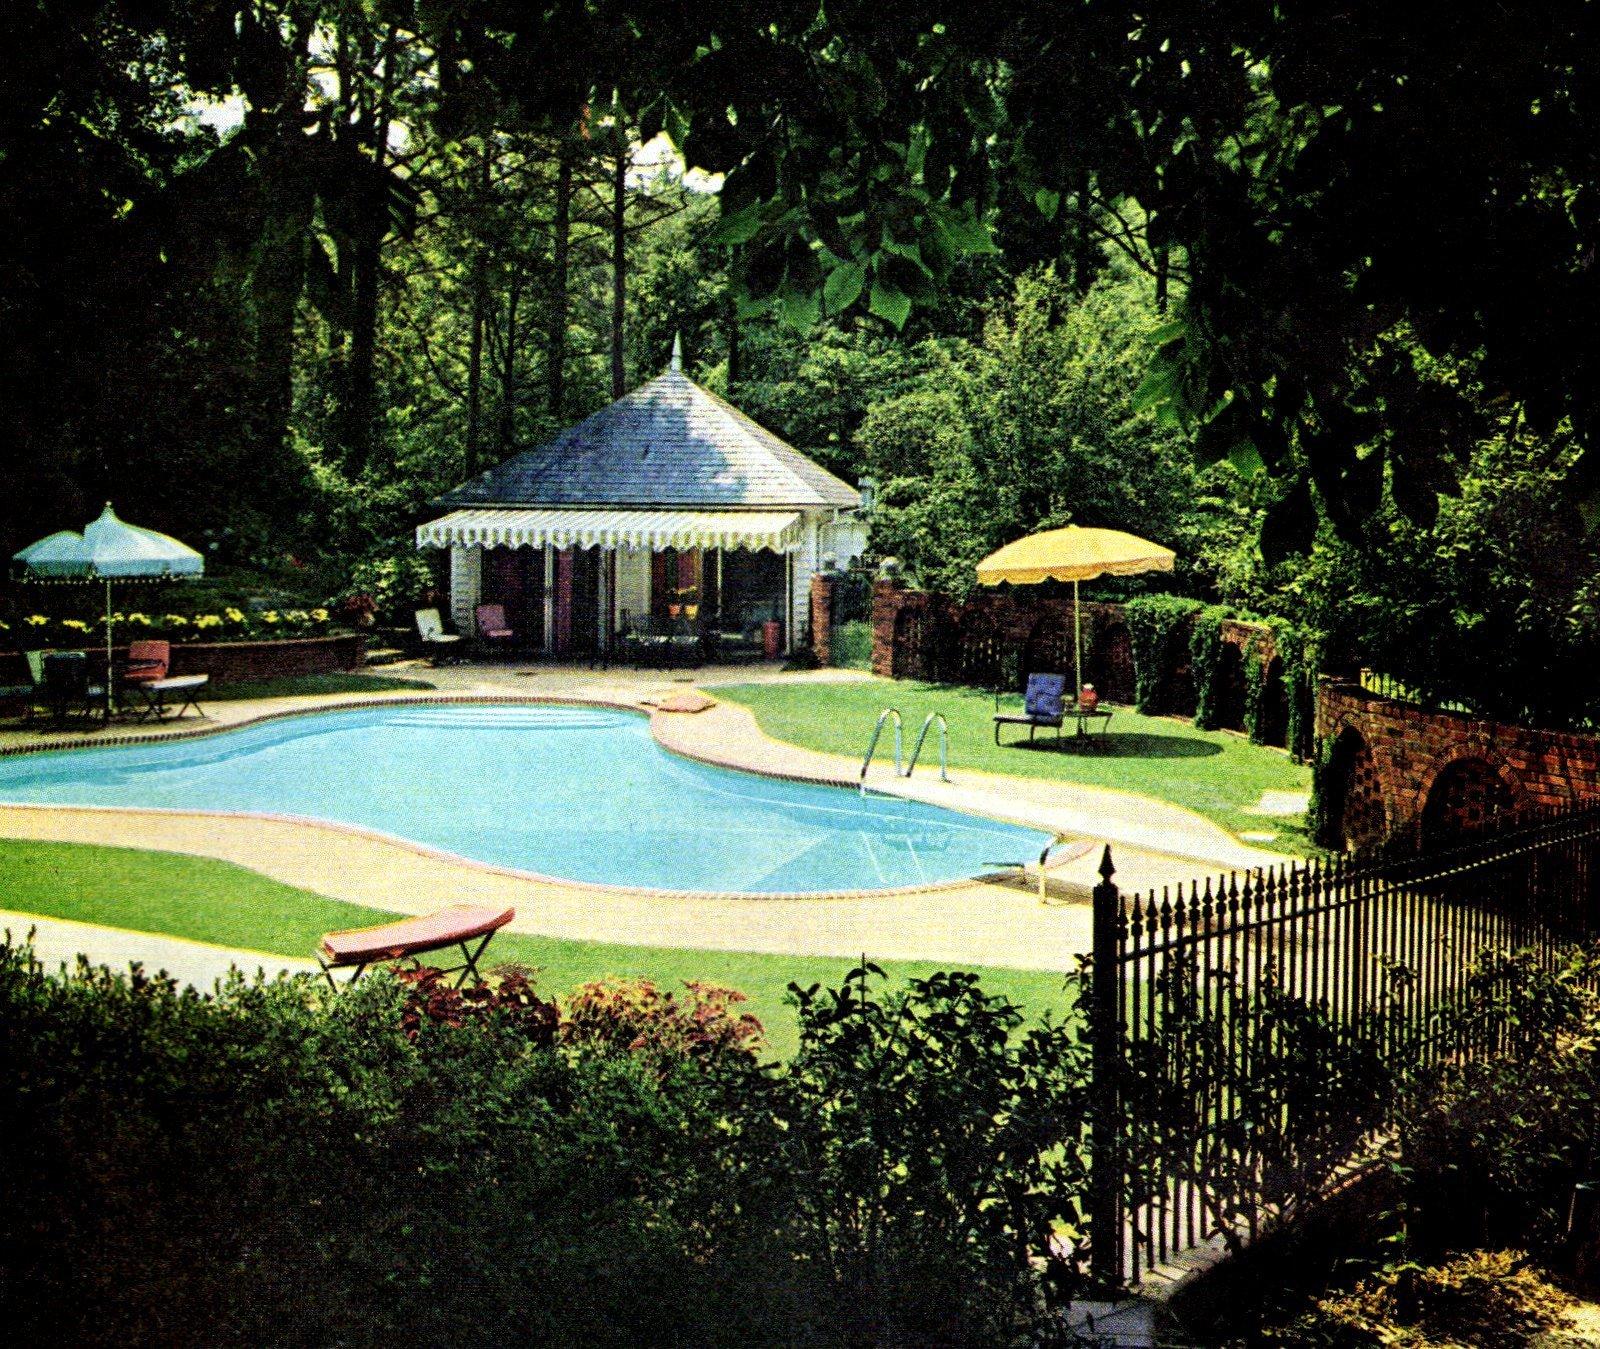 Summer 1967 - Backyard pool and cabana house